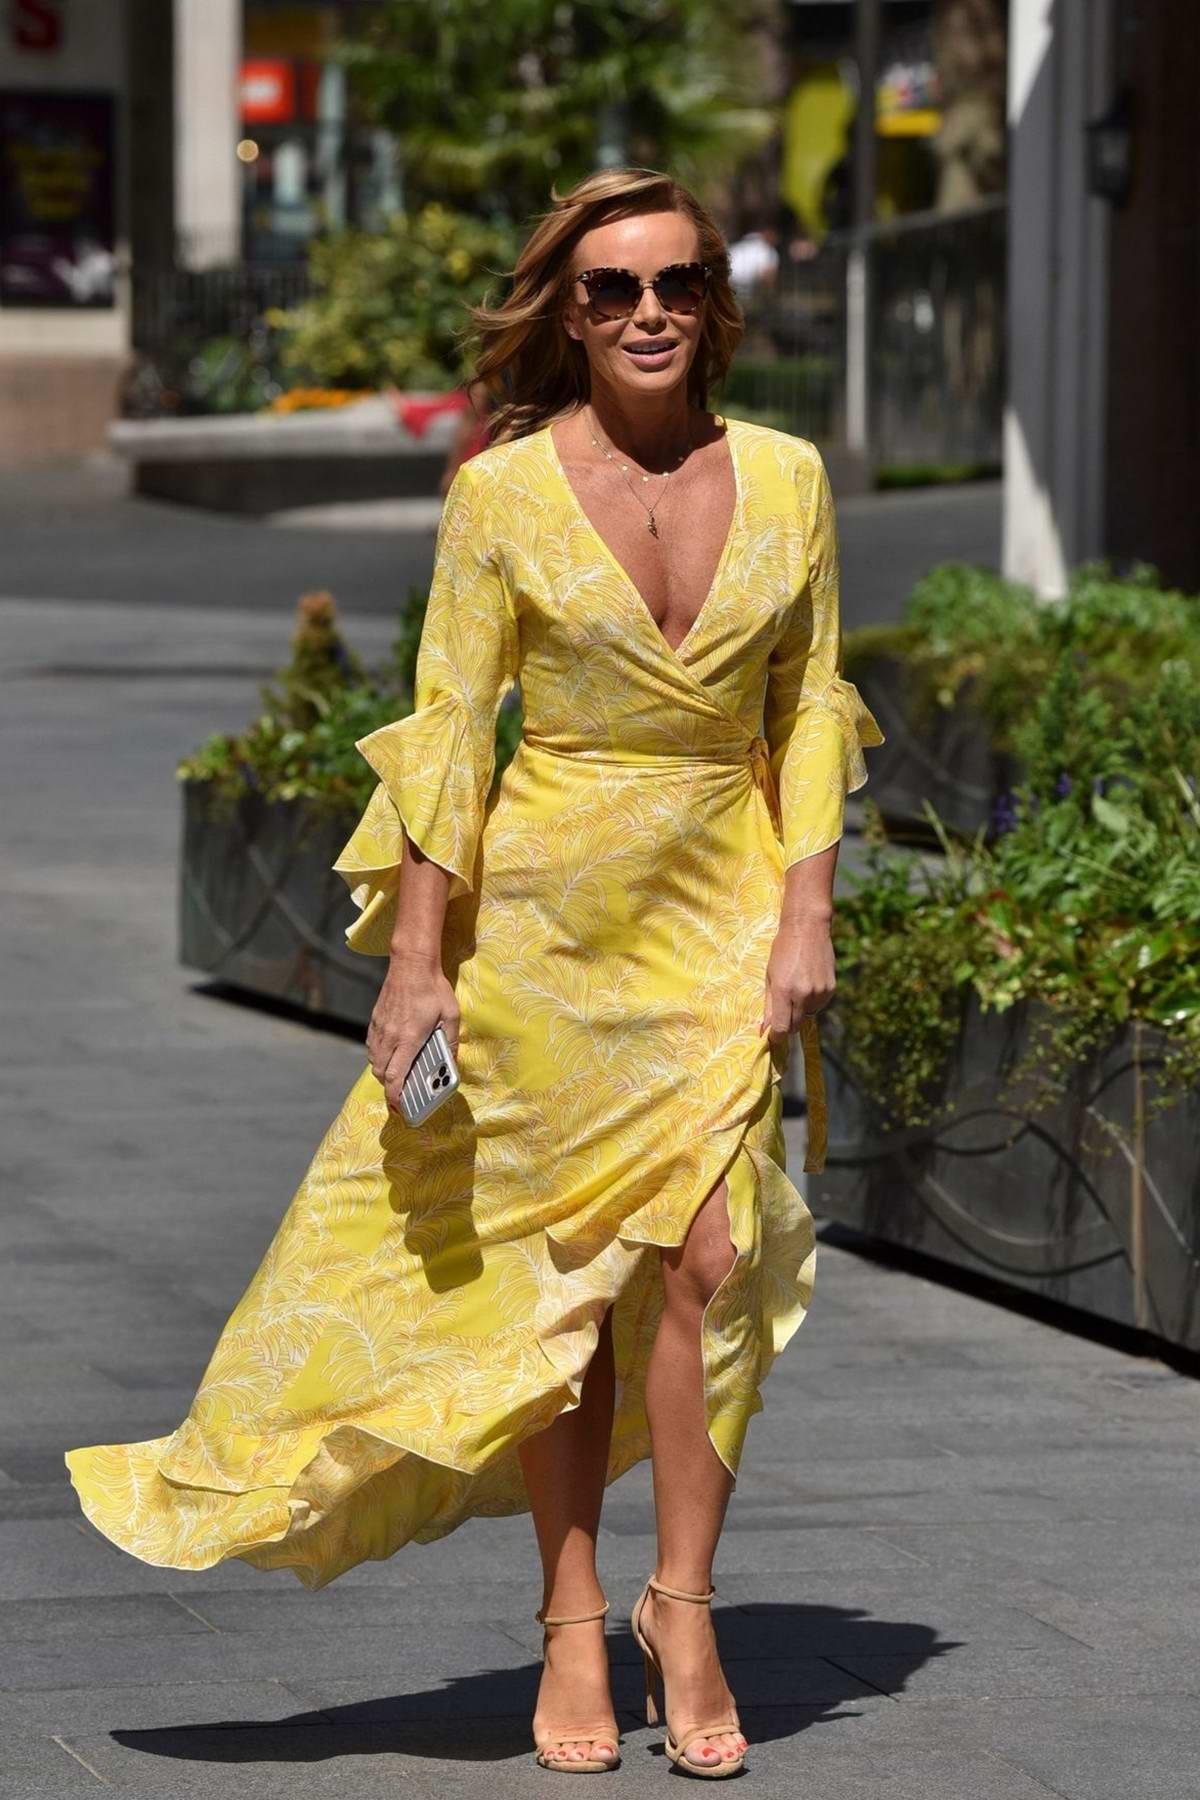 Amanda Holden looks striking in a yellow dress as she leaves Global Radio Studio in London, UK